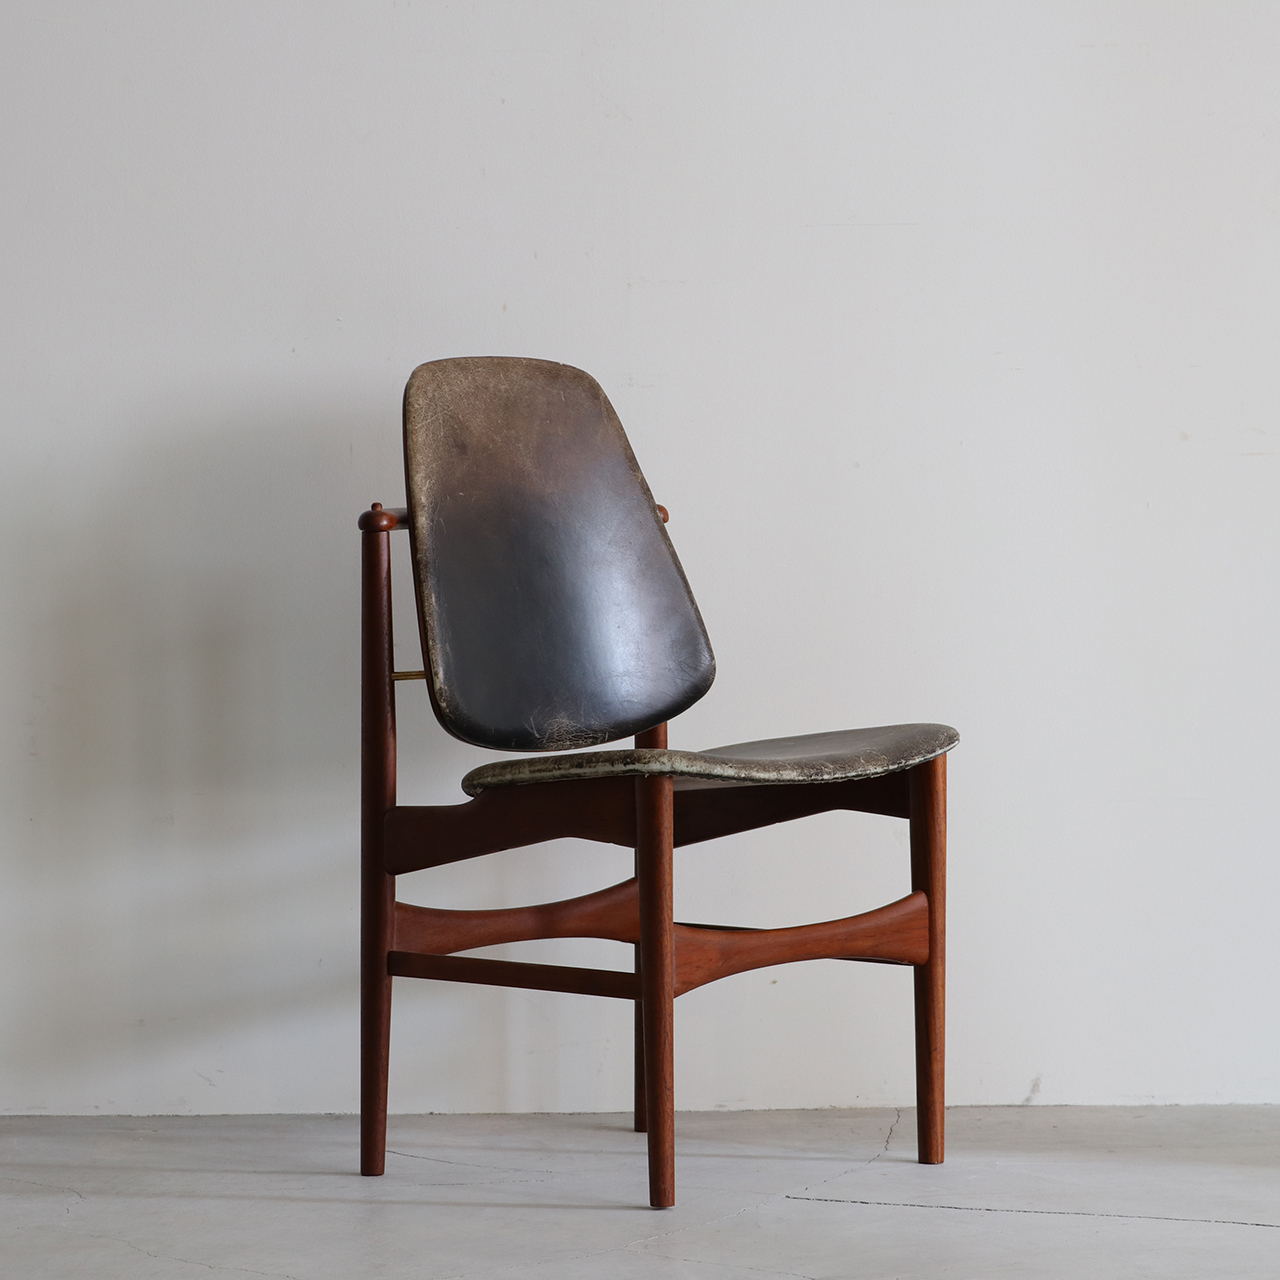 Dining chair / Onsild Møbelfabrik / Arne Hovmand-Olsen